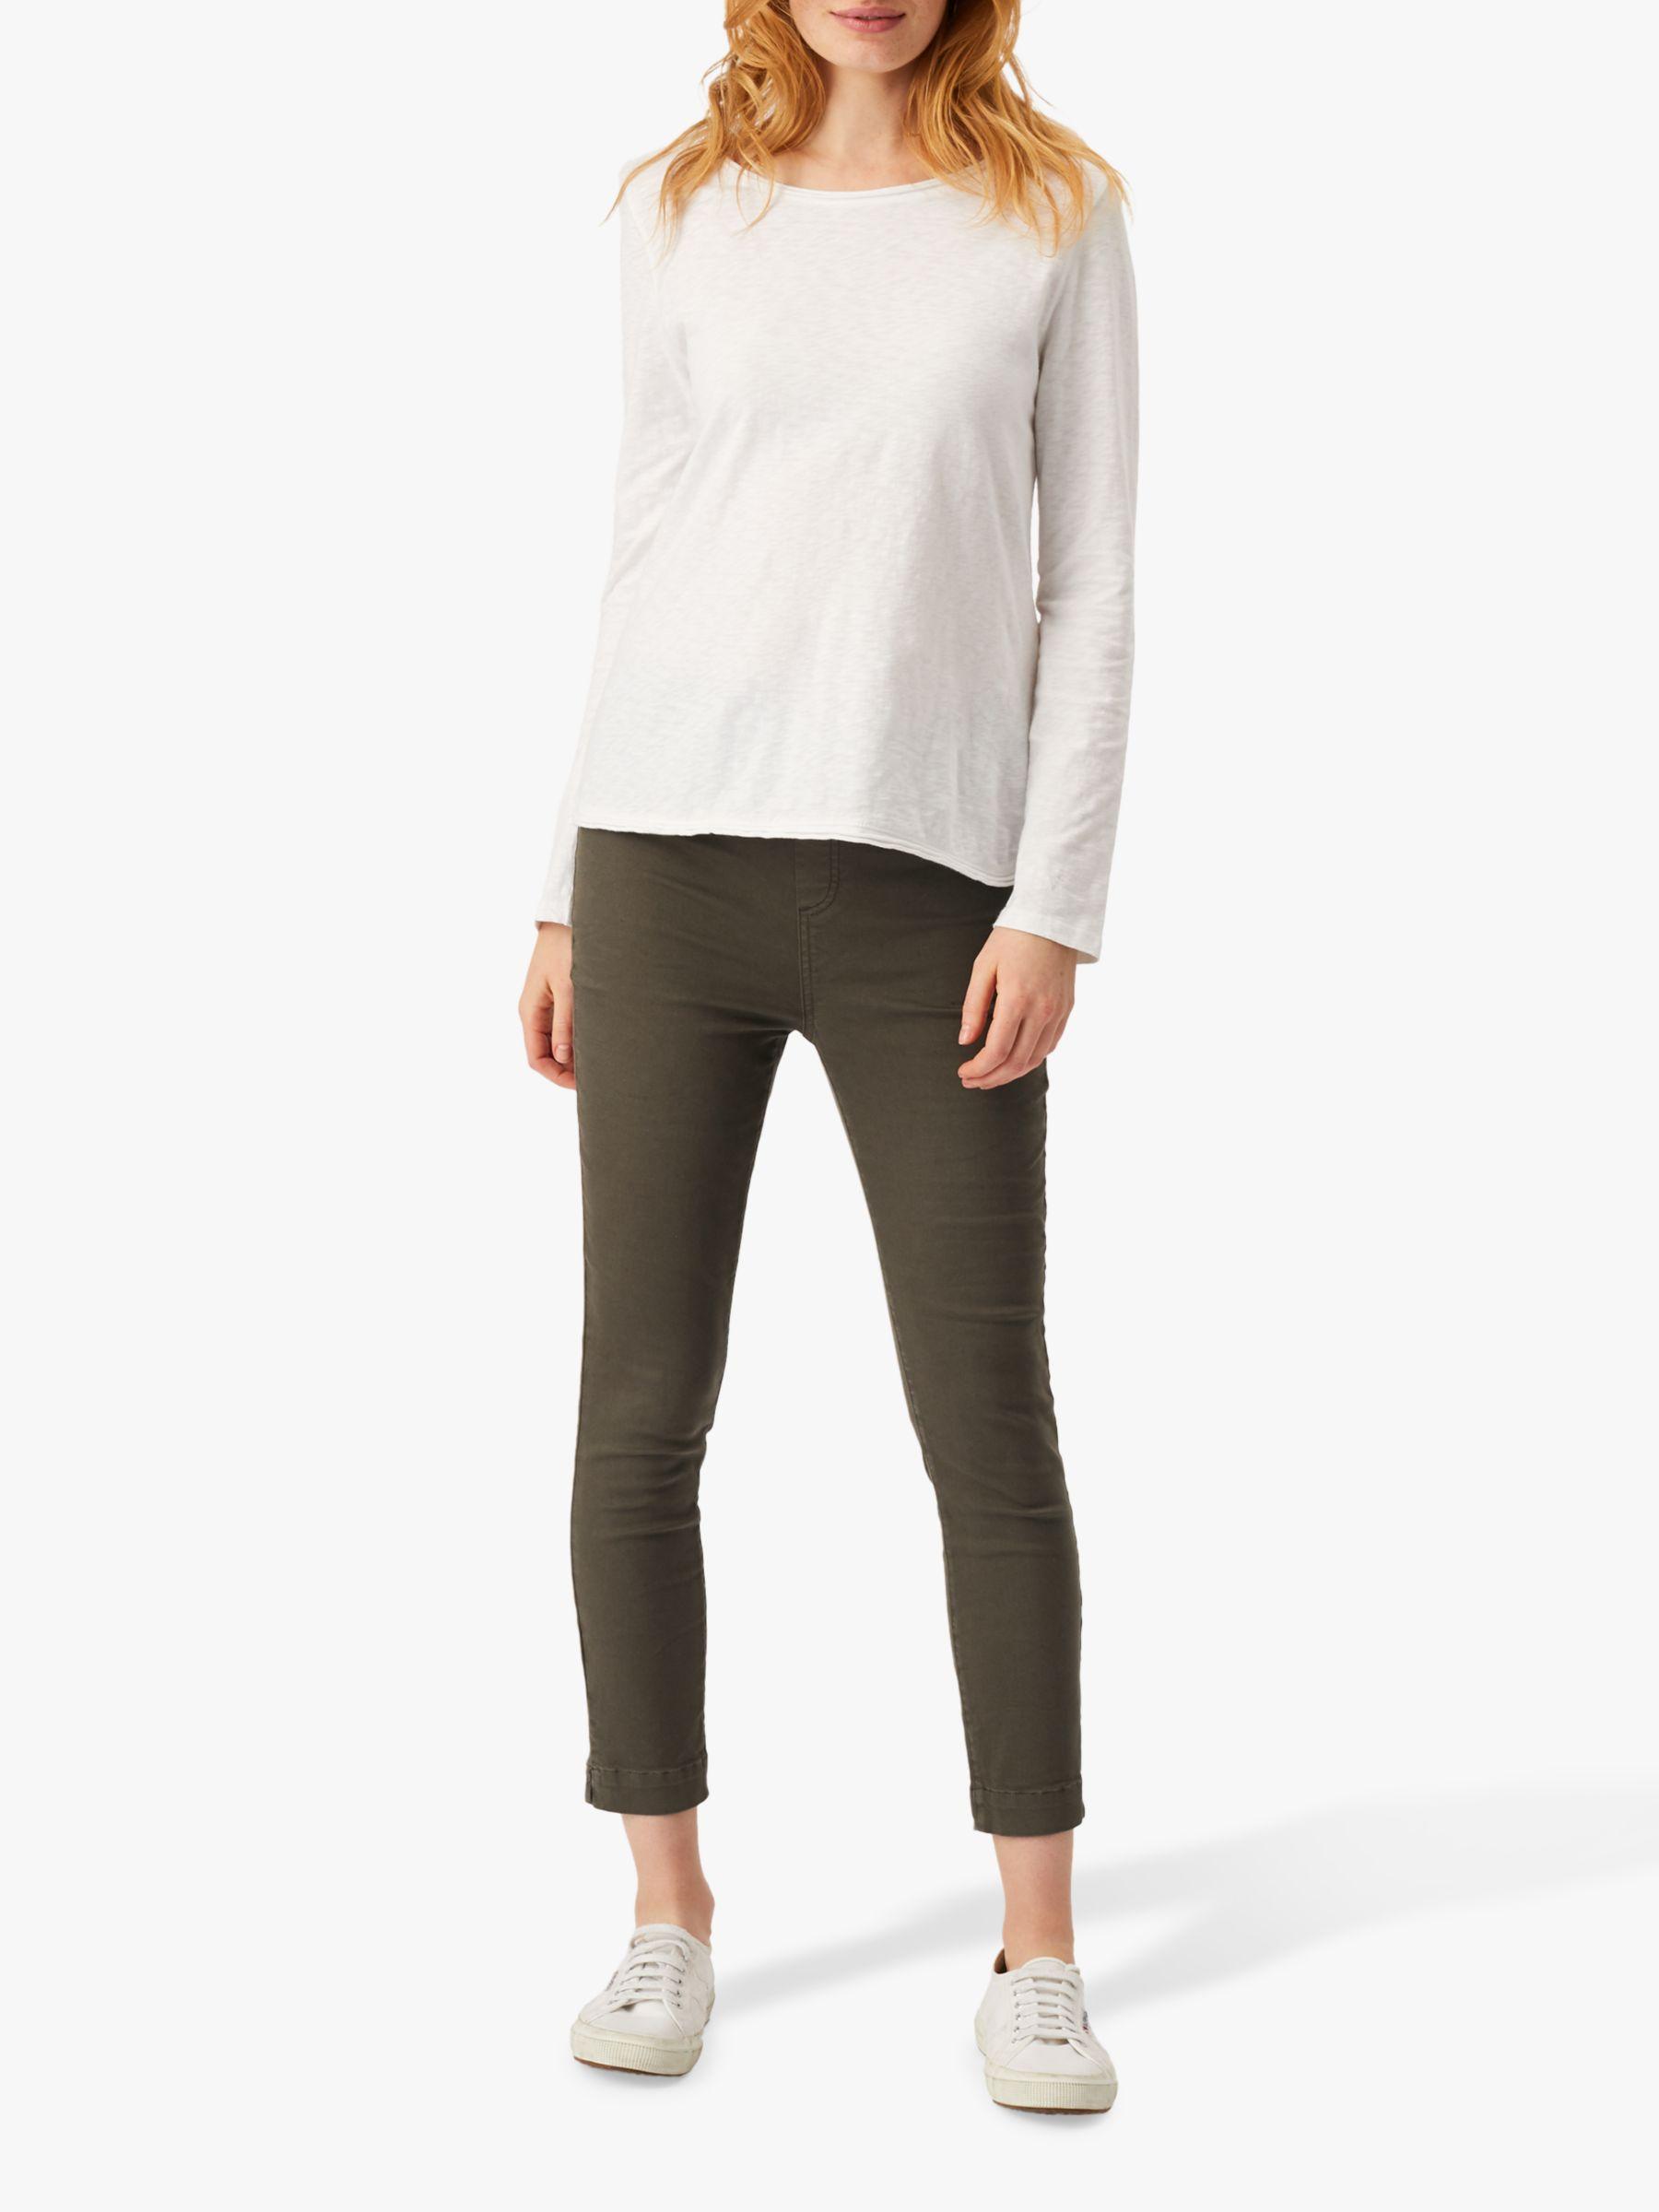 da7919b9988b39 White Stuff. Women's Jade Cropped Jegging Jeans